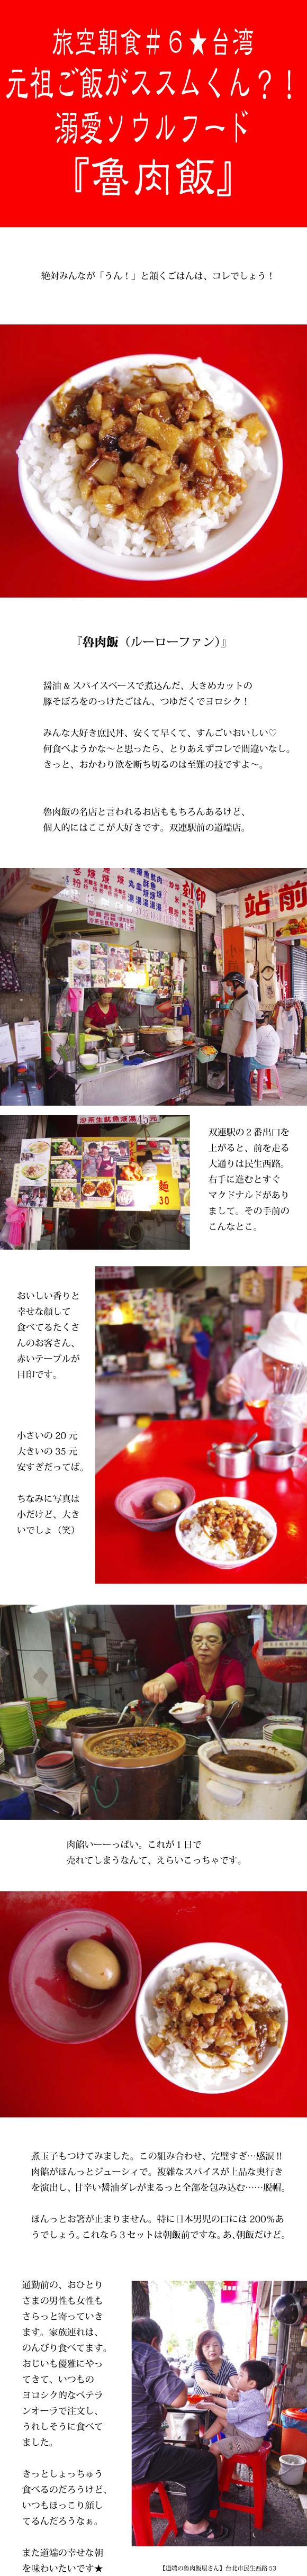 tomako170105.jpg